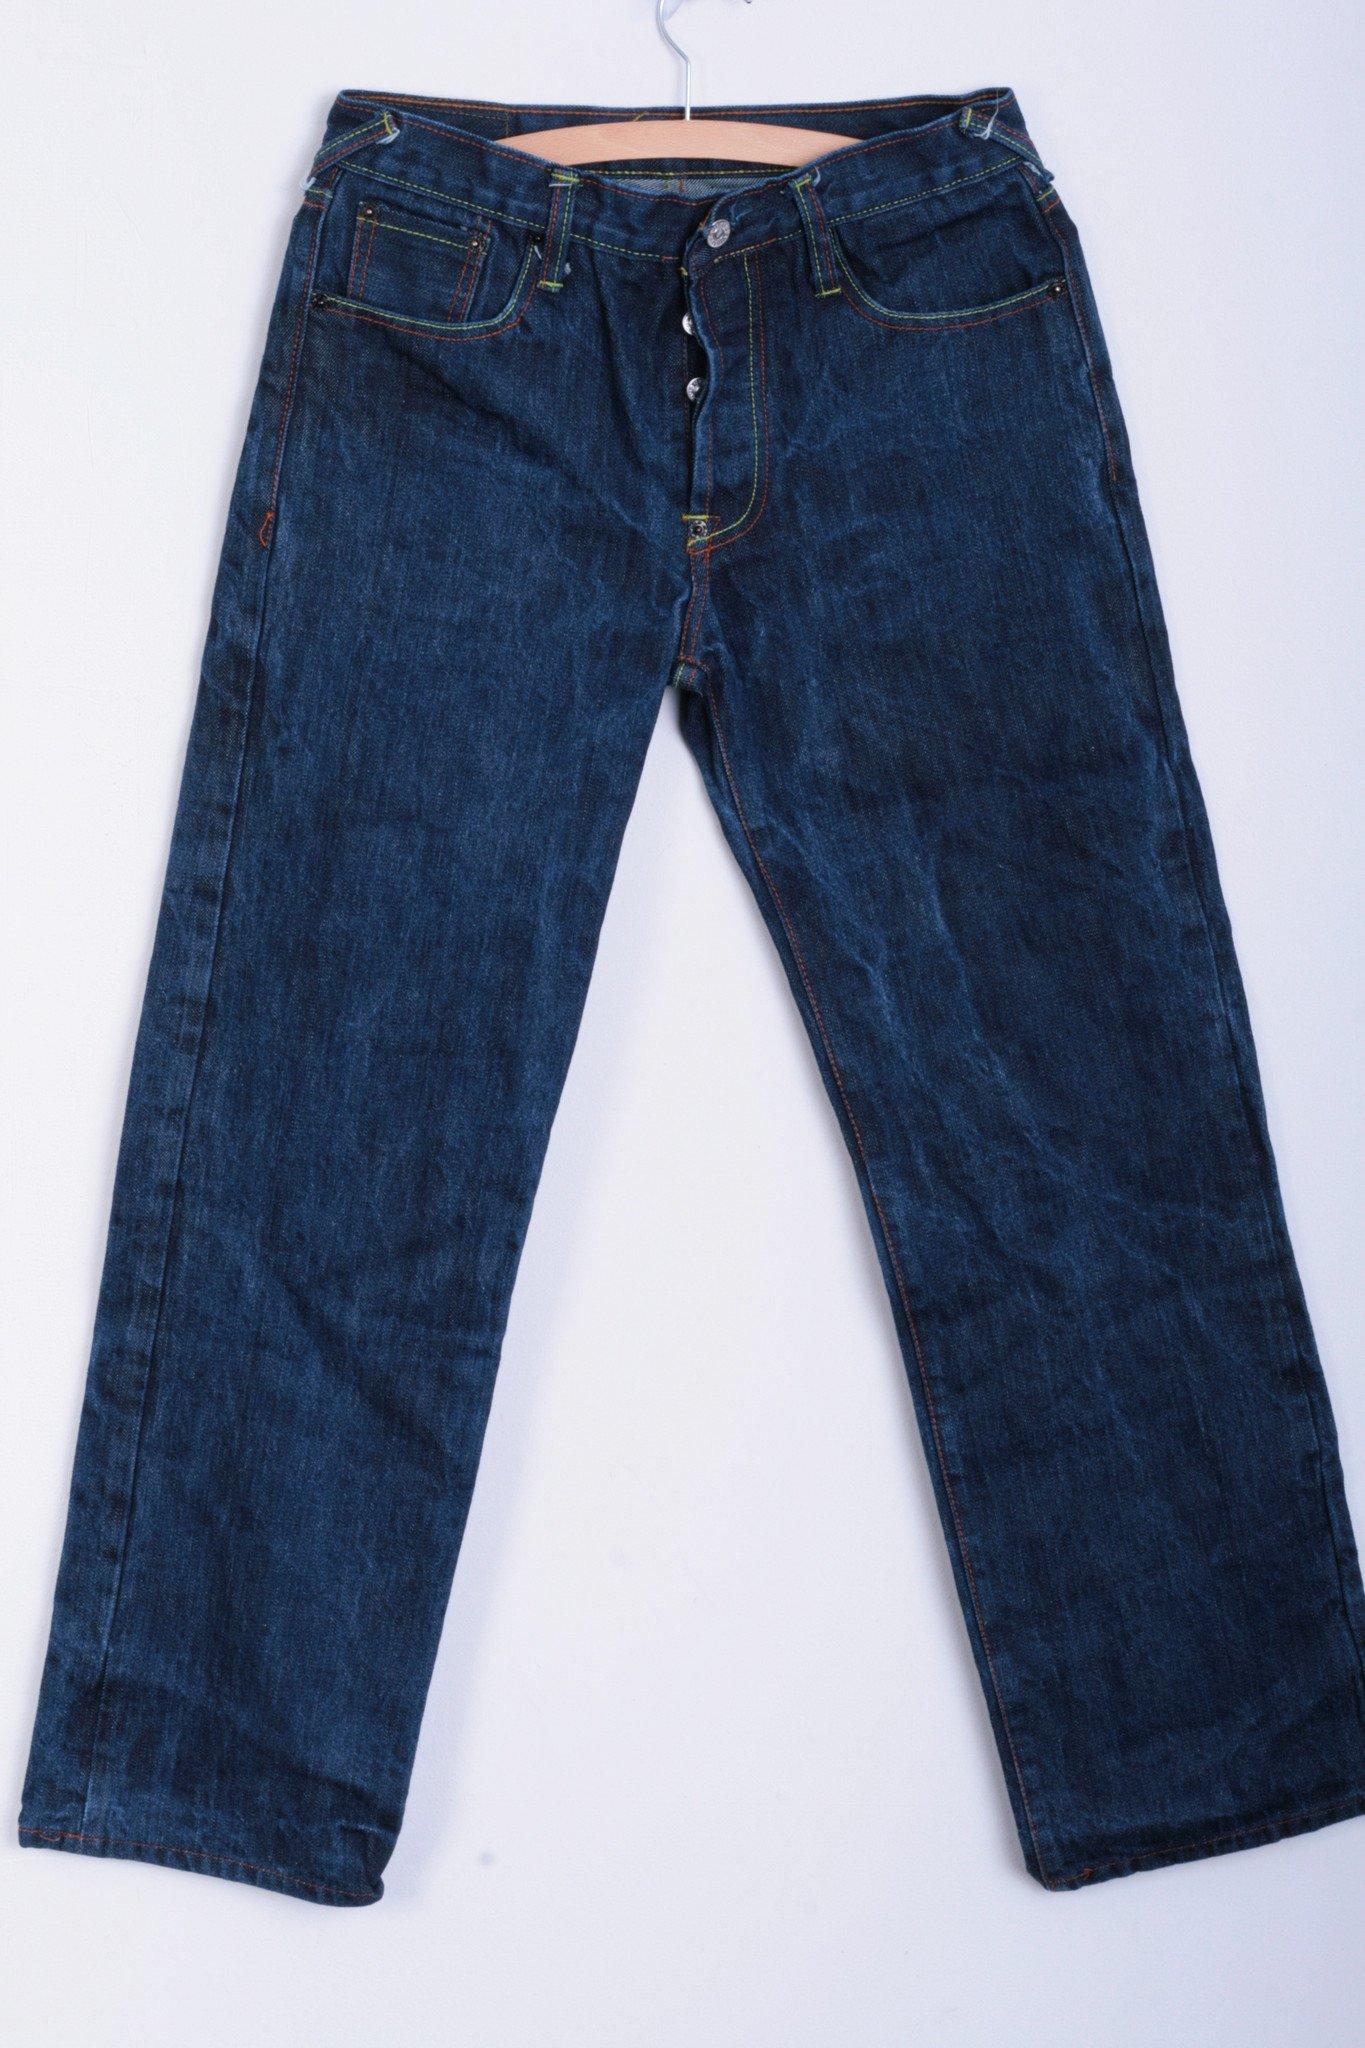 0b5dd58f1170 Evisu Evisu Mens W30 Trousers Jeans Cotton Dark Blue Denim 8752 Size ...